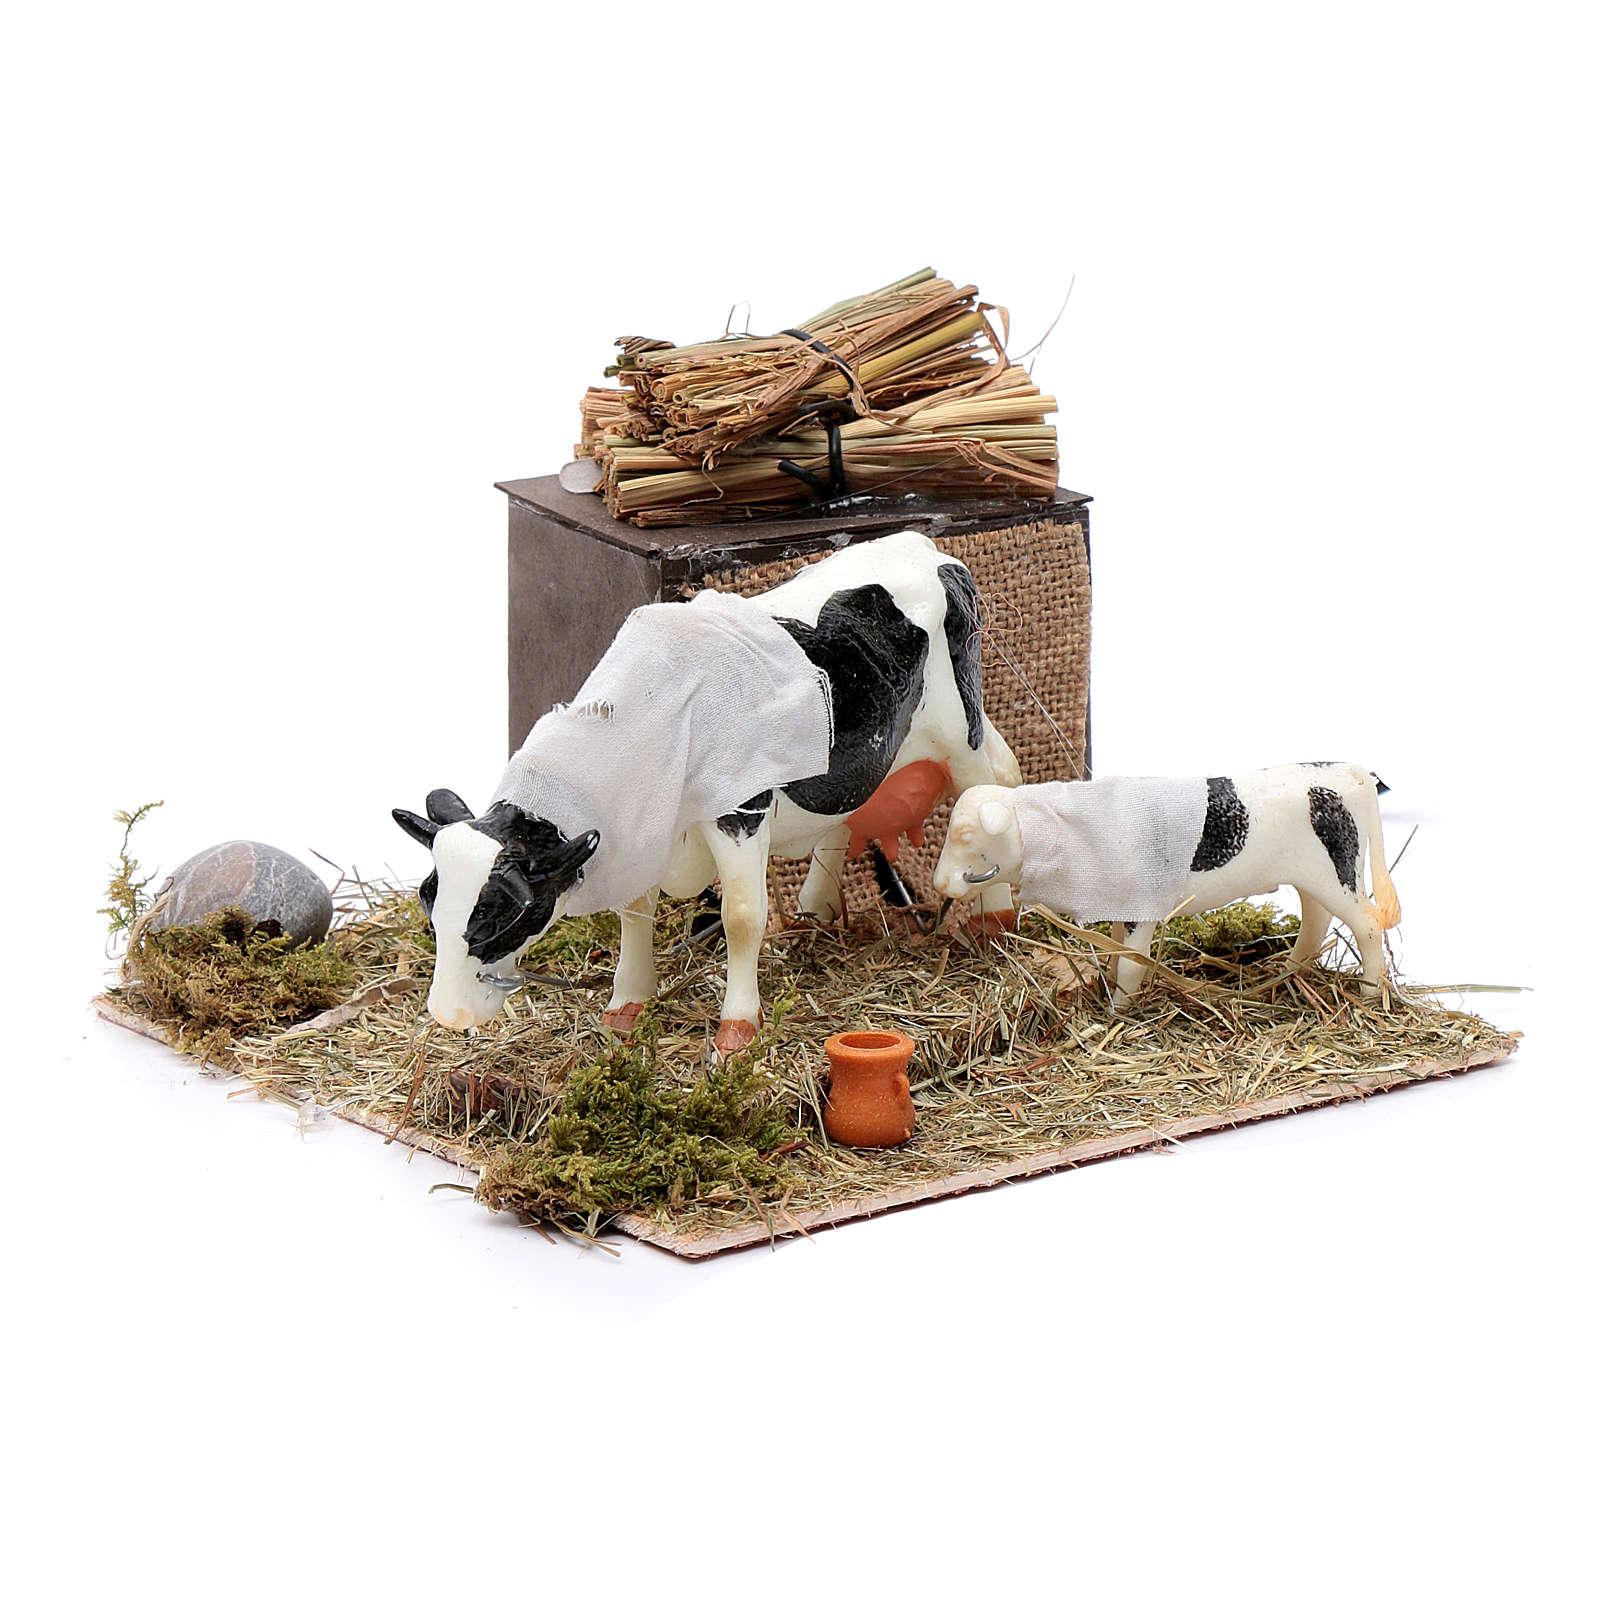 Neapolitan nativity scene moving cows with calf 12 cm 4